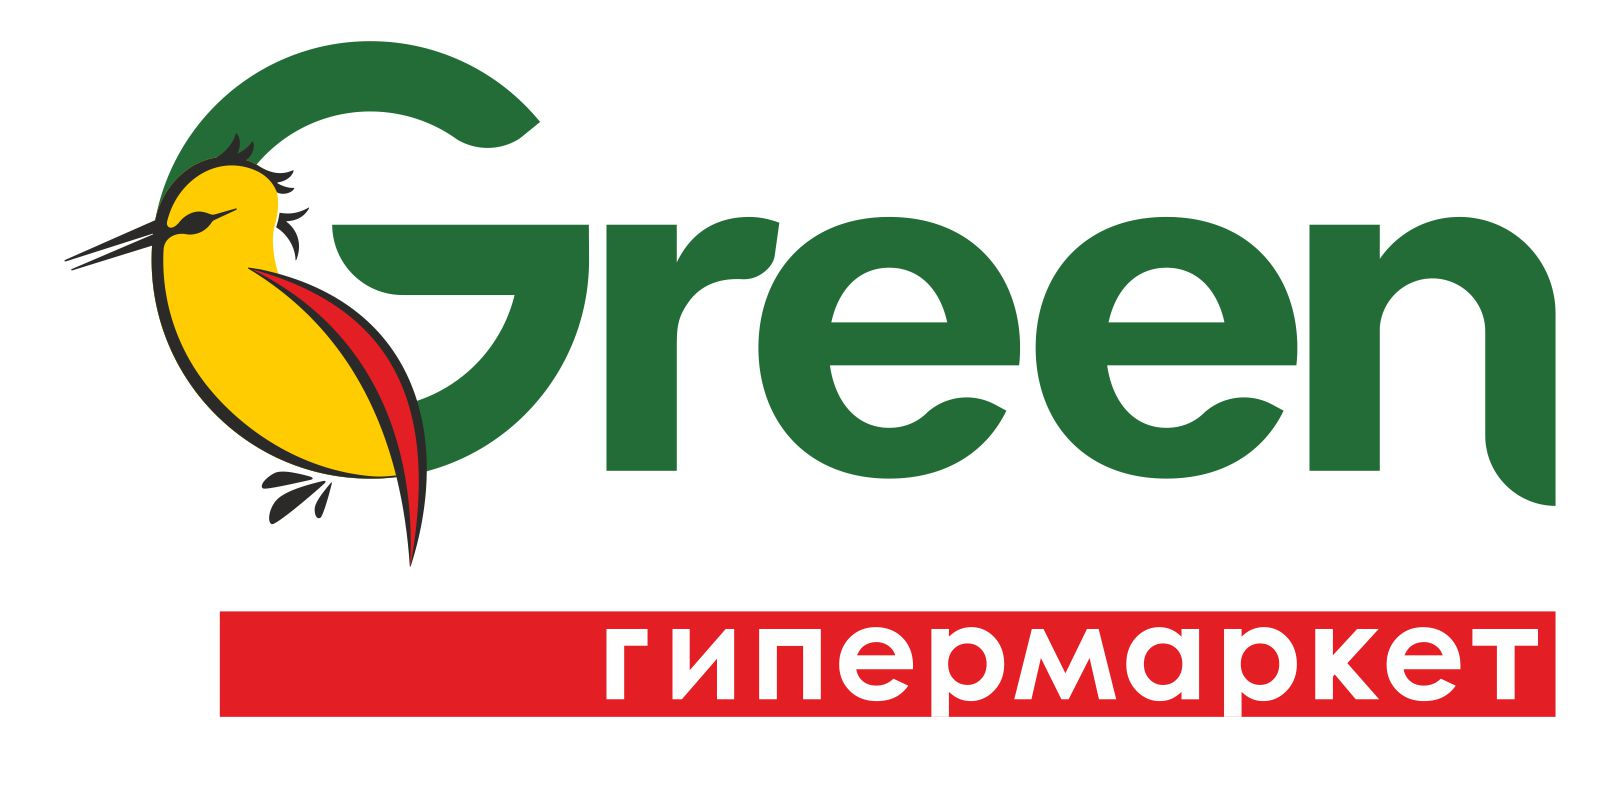 "Картинки по запросу логотип  скала грин"" минск"